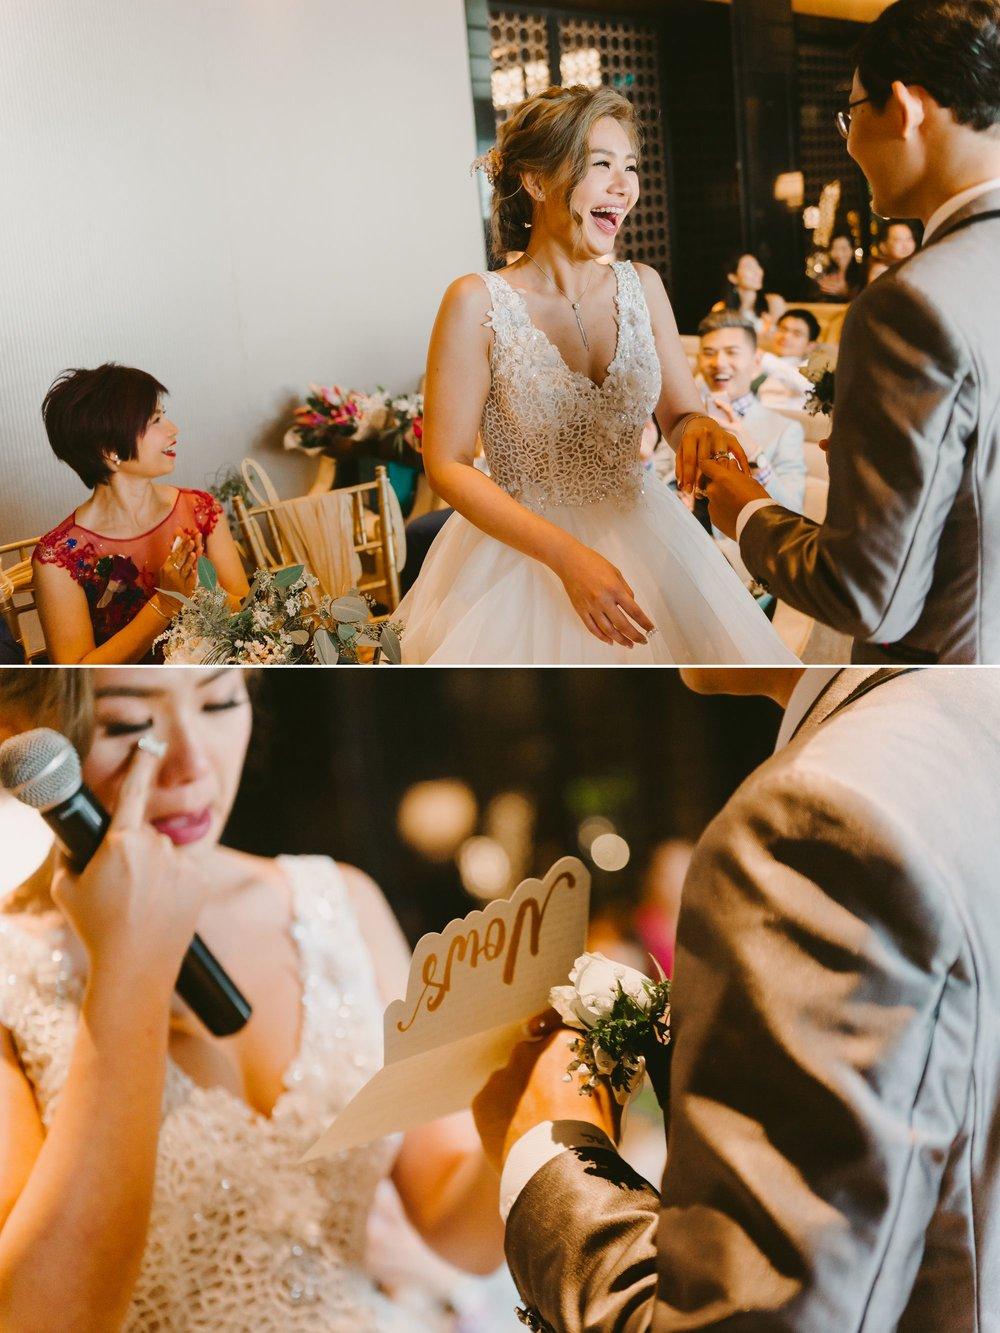 wedding_photographer_singapore 22.jpg